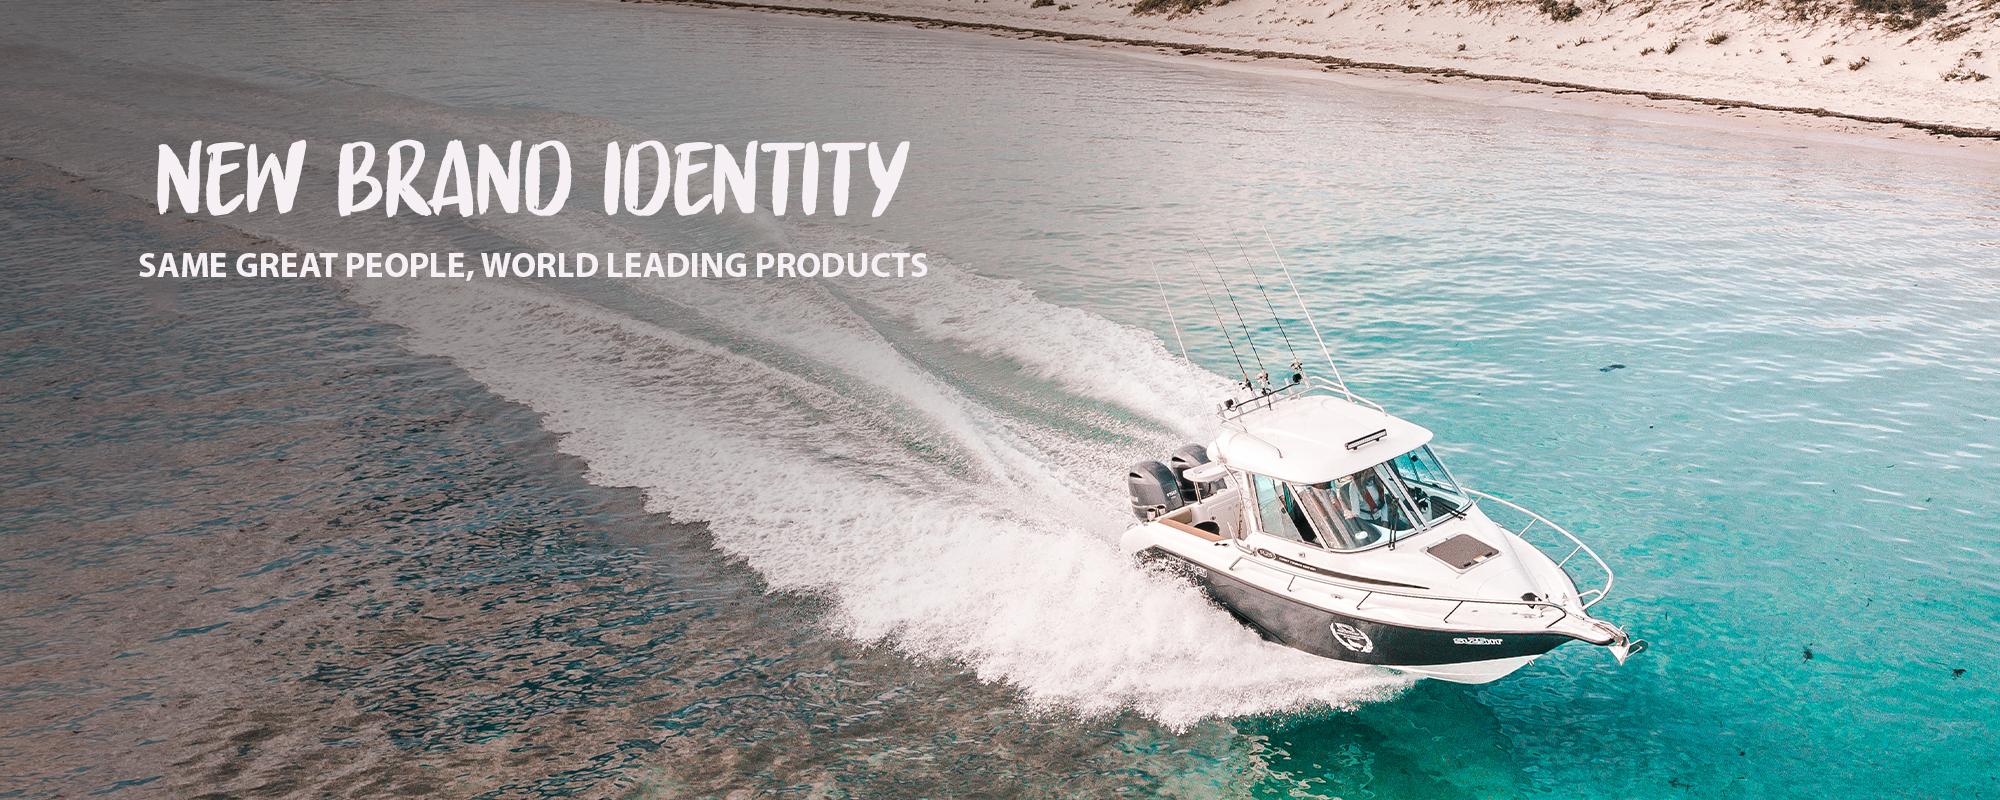 savwinch brand identity